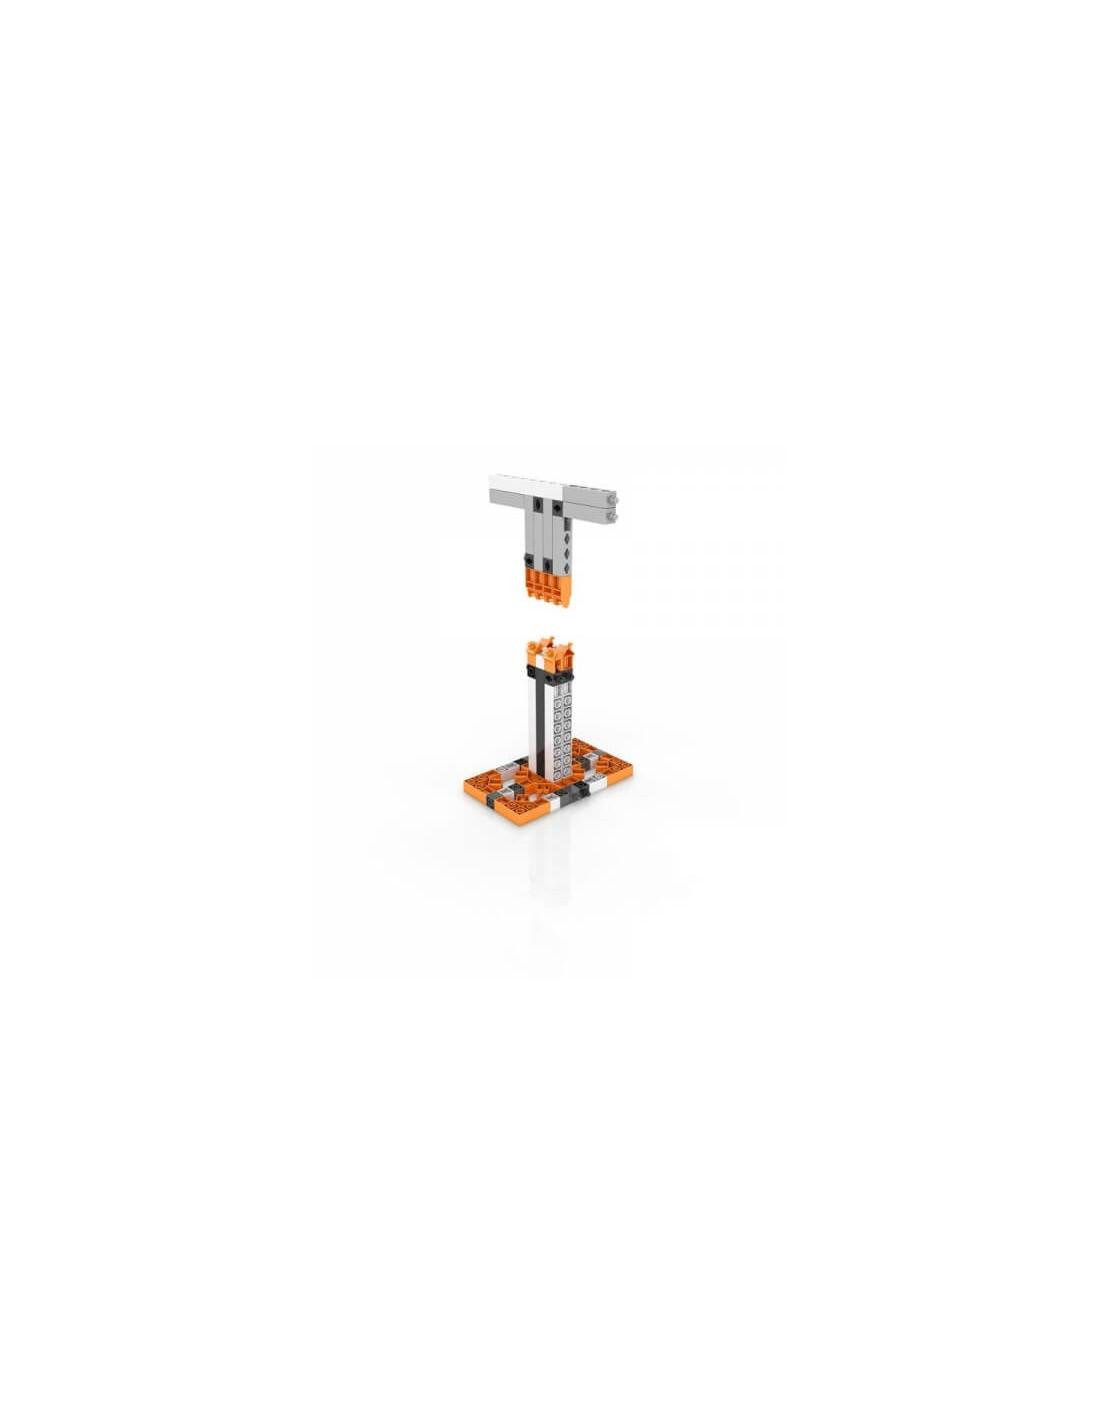 Set de constructie - STEM Wheels, Axles and Inclined Planes | Engino - 3